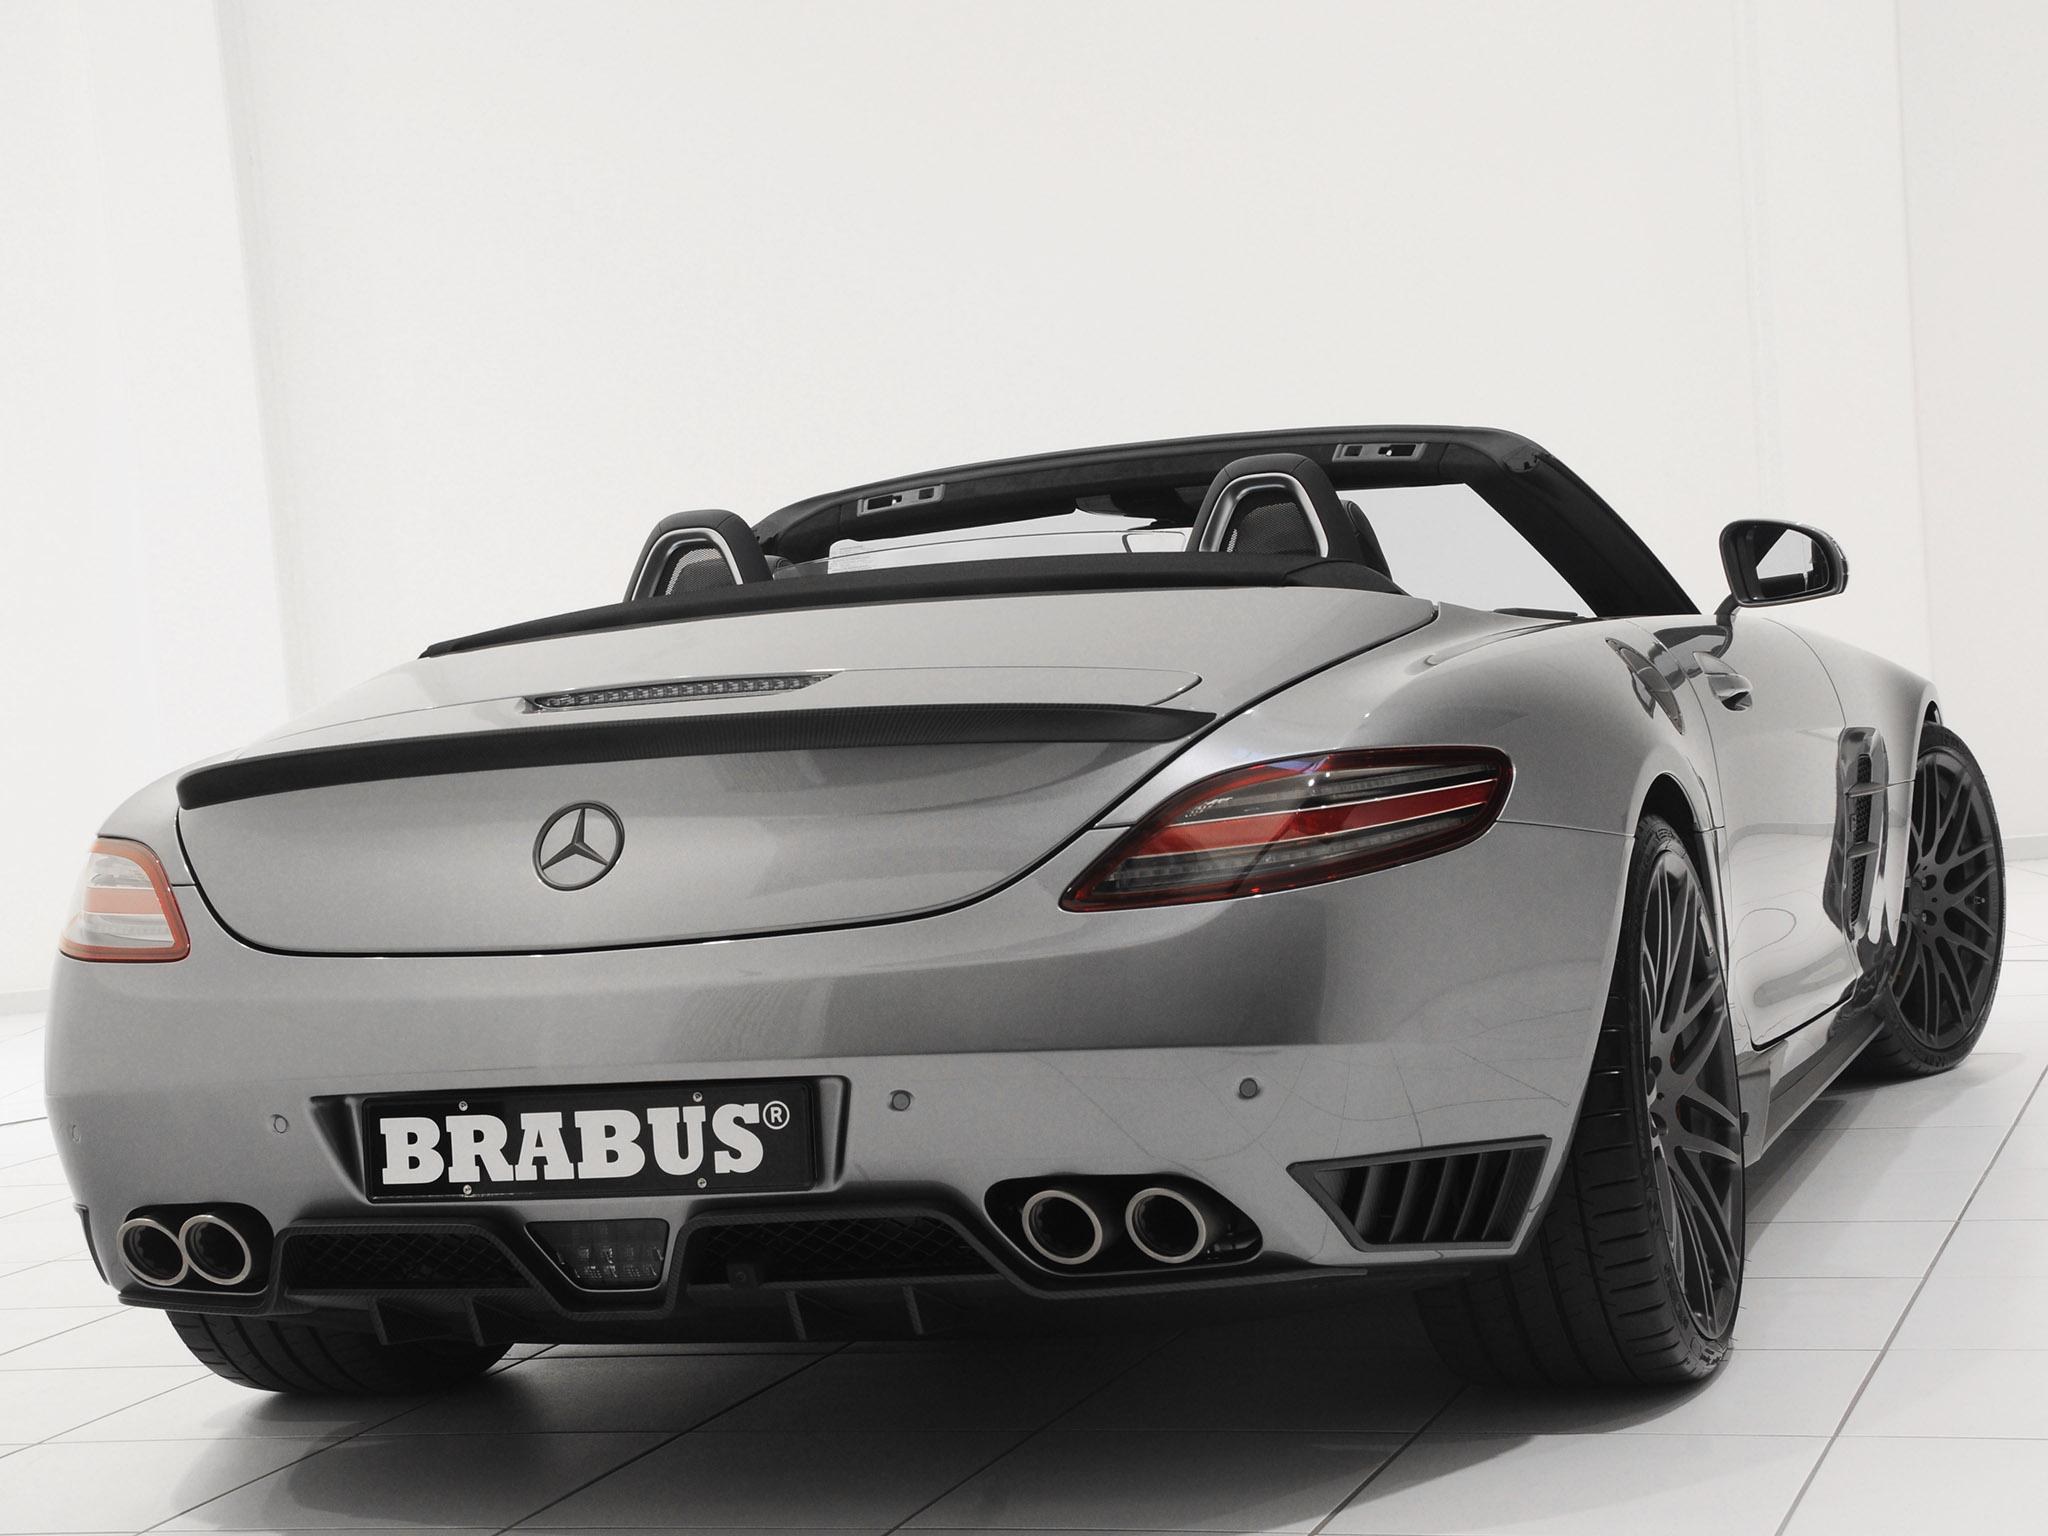 2011 Brabus AMG Mercedes SLS Roadster